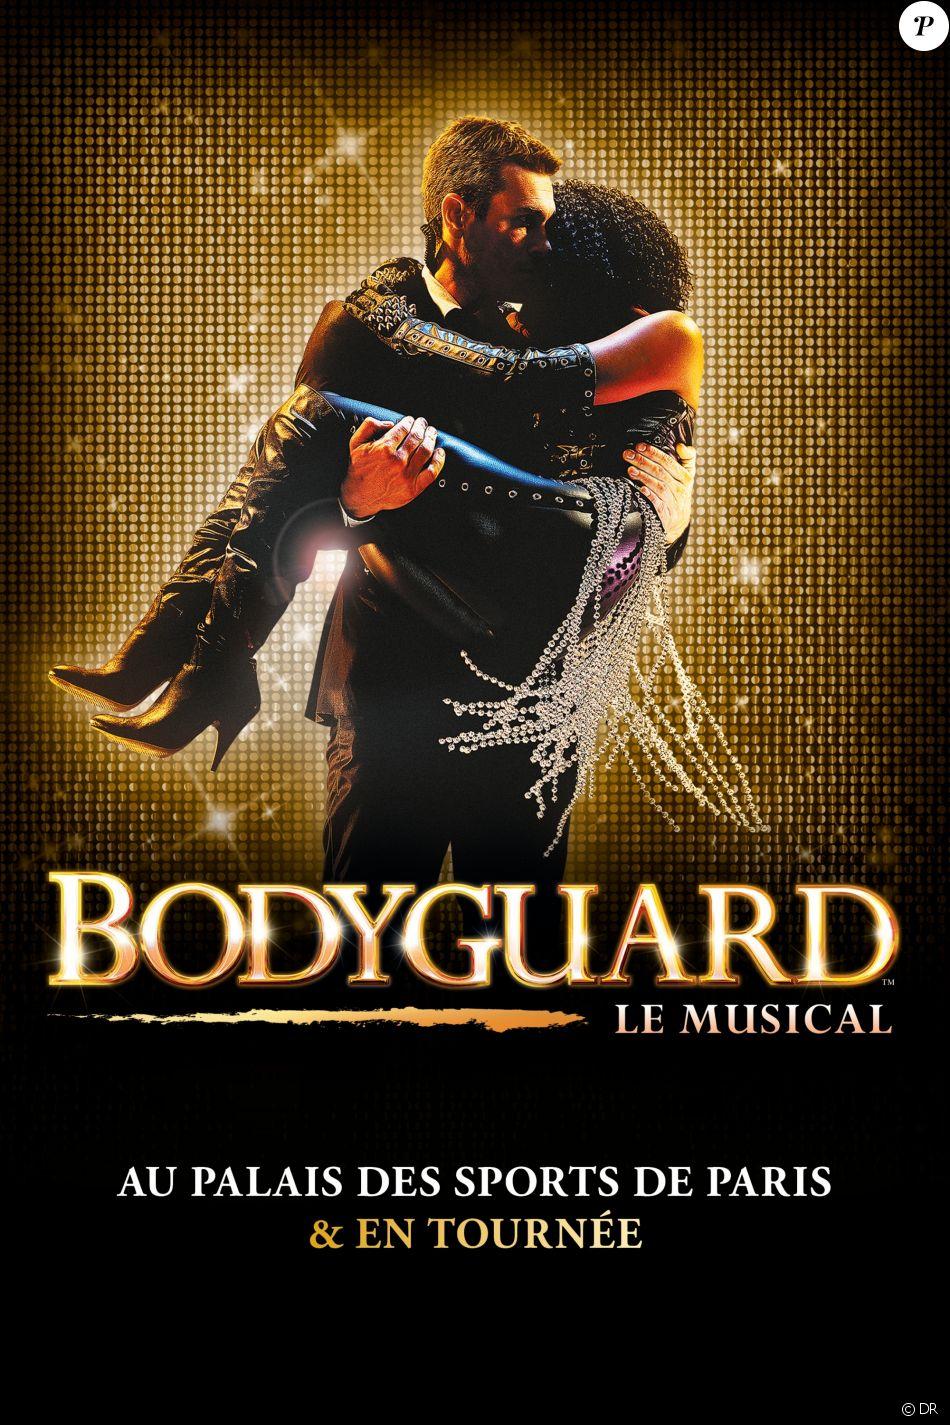 Affiche du musical Bodyguard